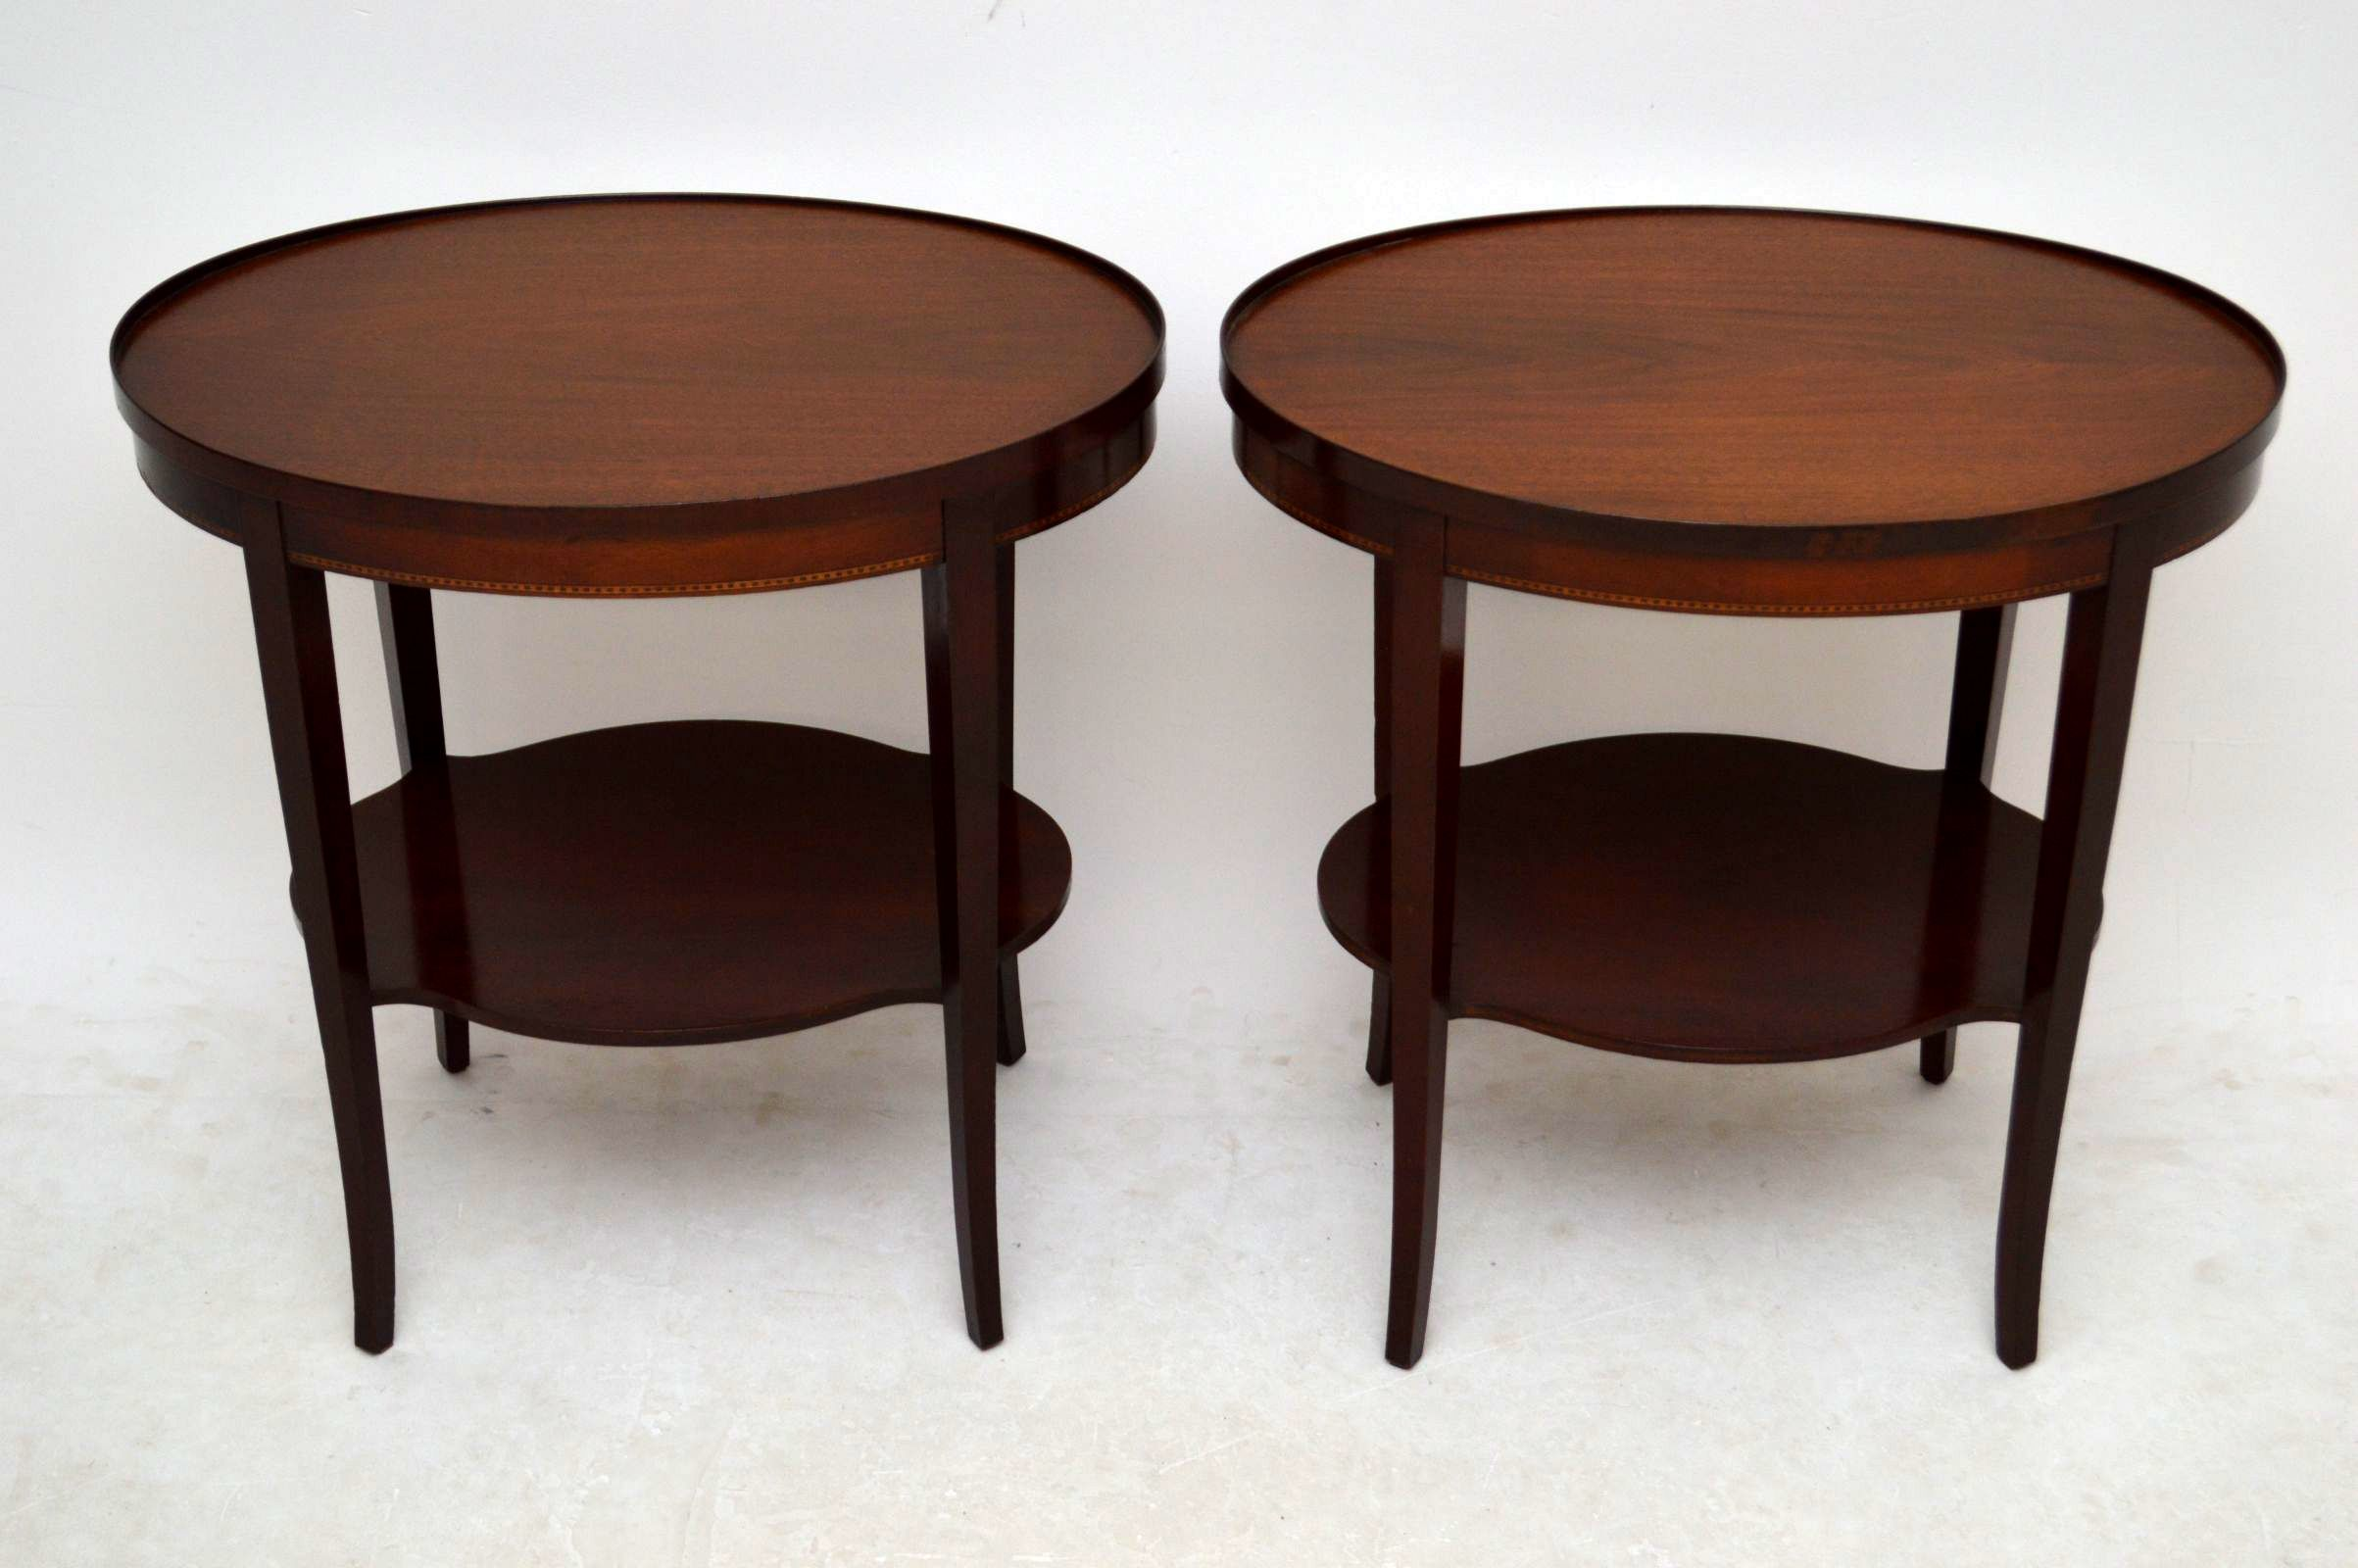 paar ovale beistelltische antik mahagoni. Black Bedroom Furniture Sets. Home Design Ideas